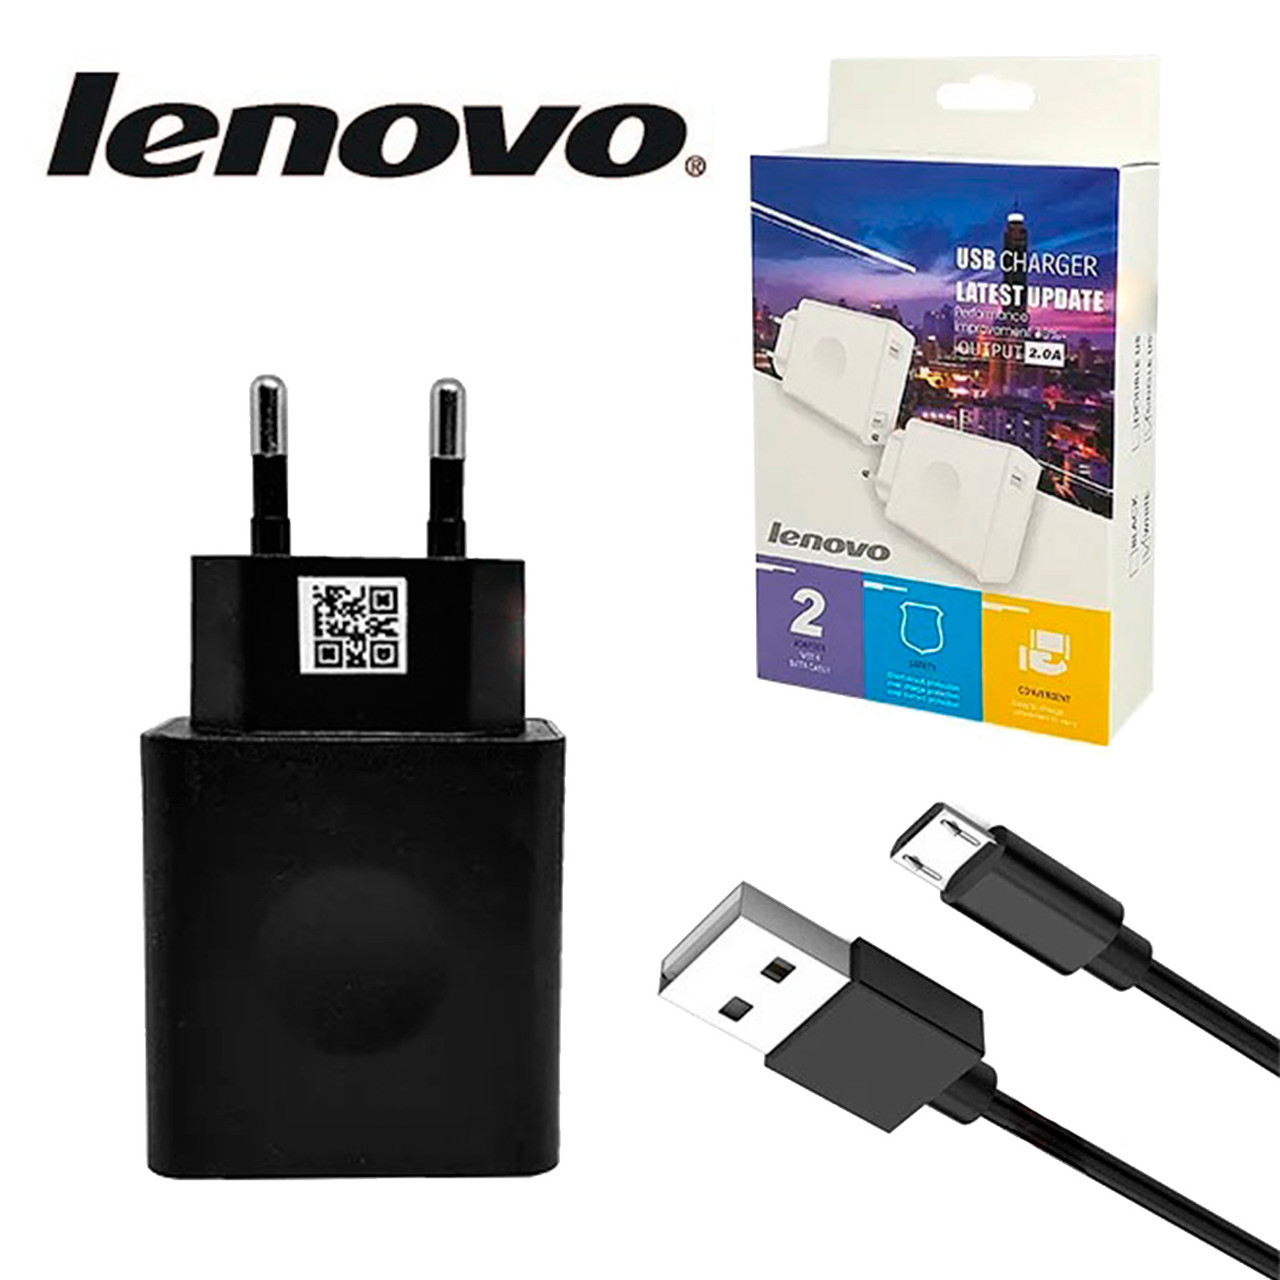 Сетевое зарядное устройство Lenovo Micro USB 2in1 1USB Port 2.0A